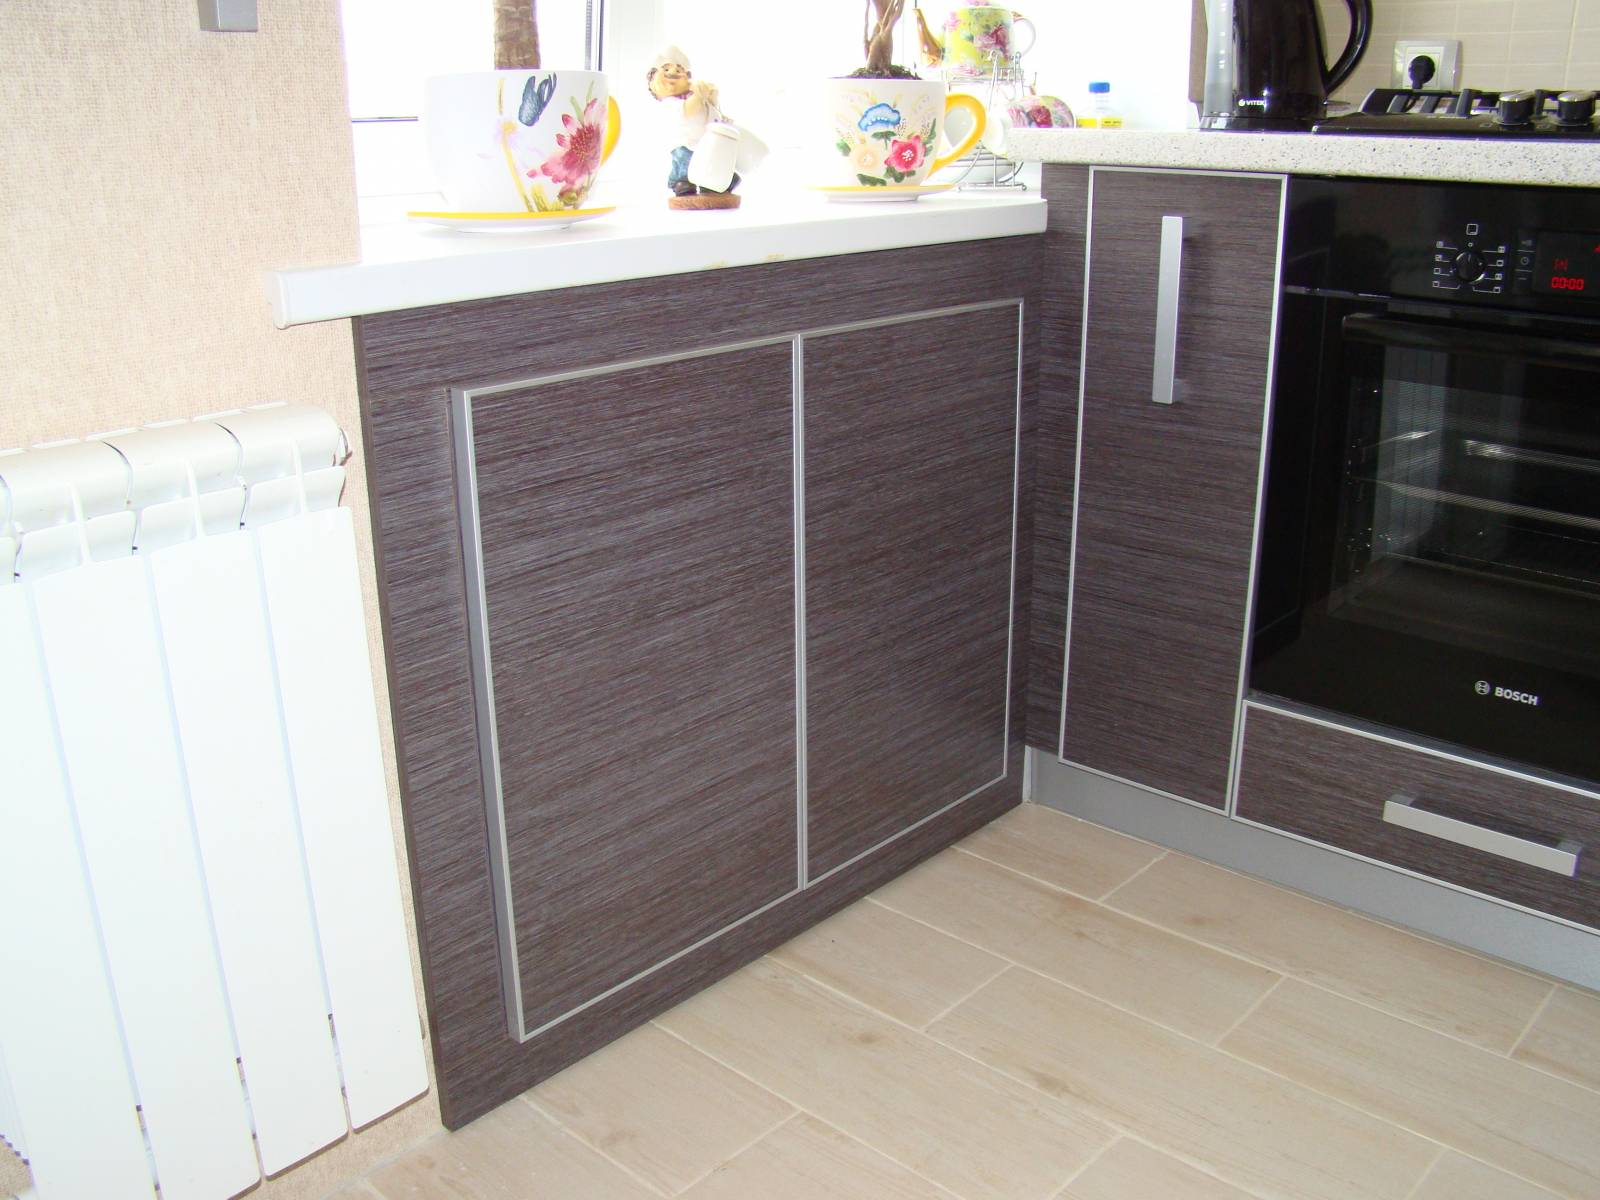 Холодильник под окном под кухонный гарнитур